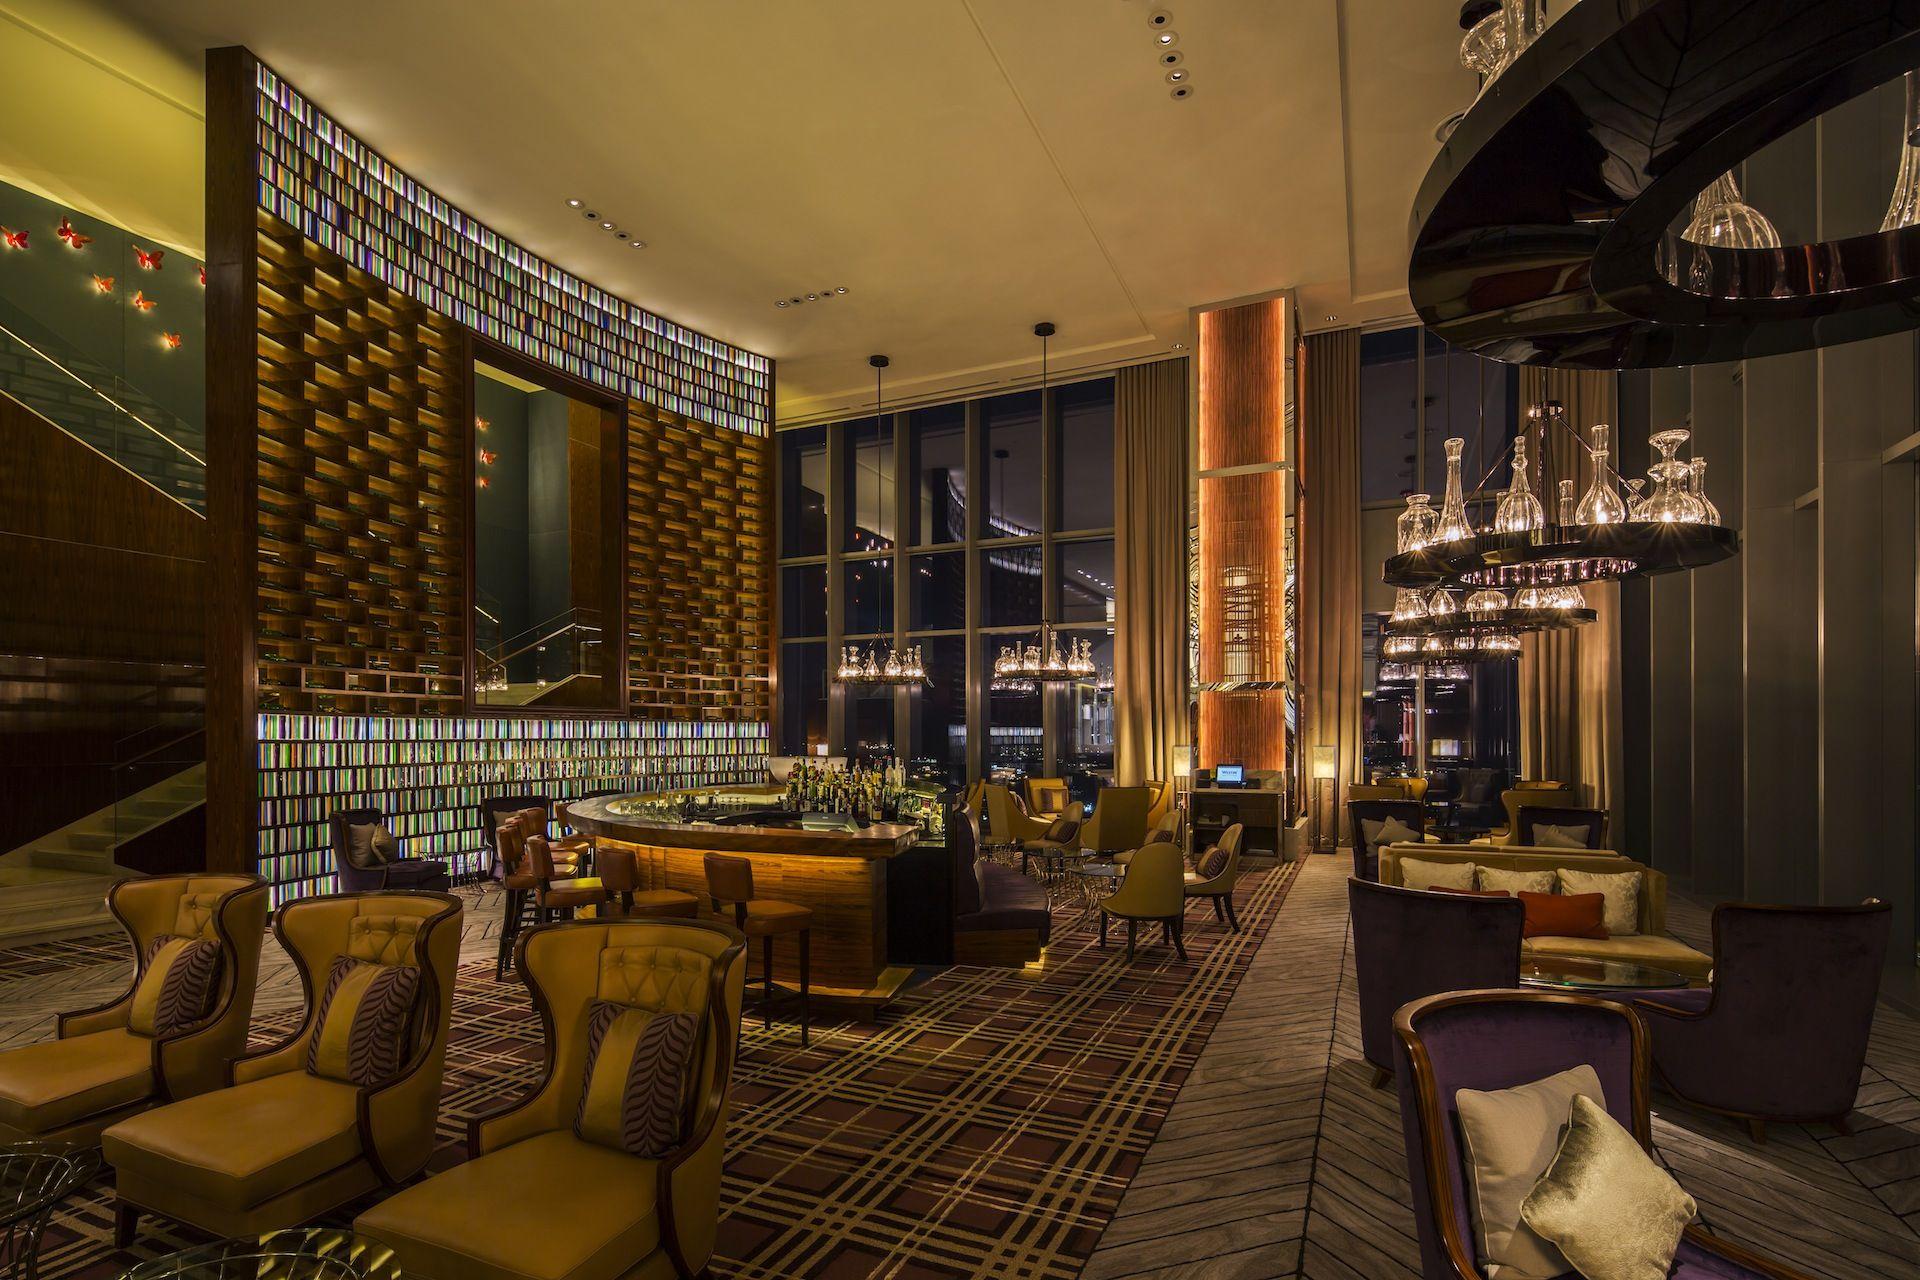 Westin Hotel Lobby-lounge Atmosphere Singapore